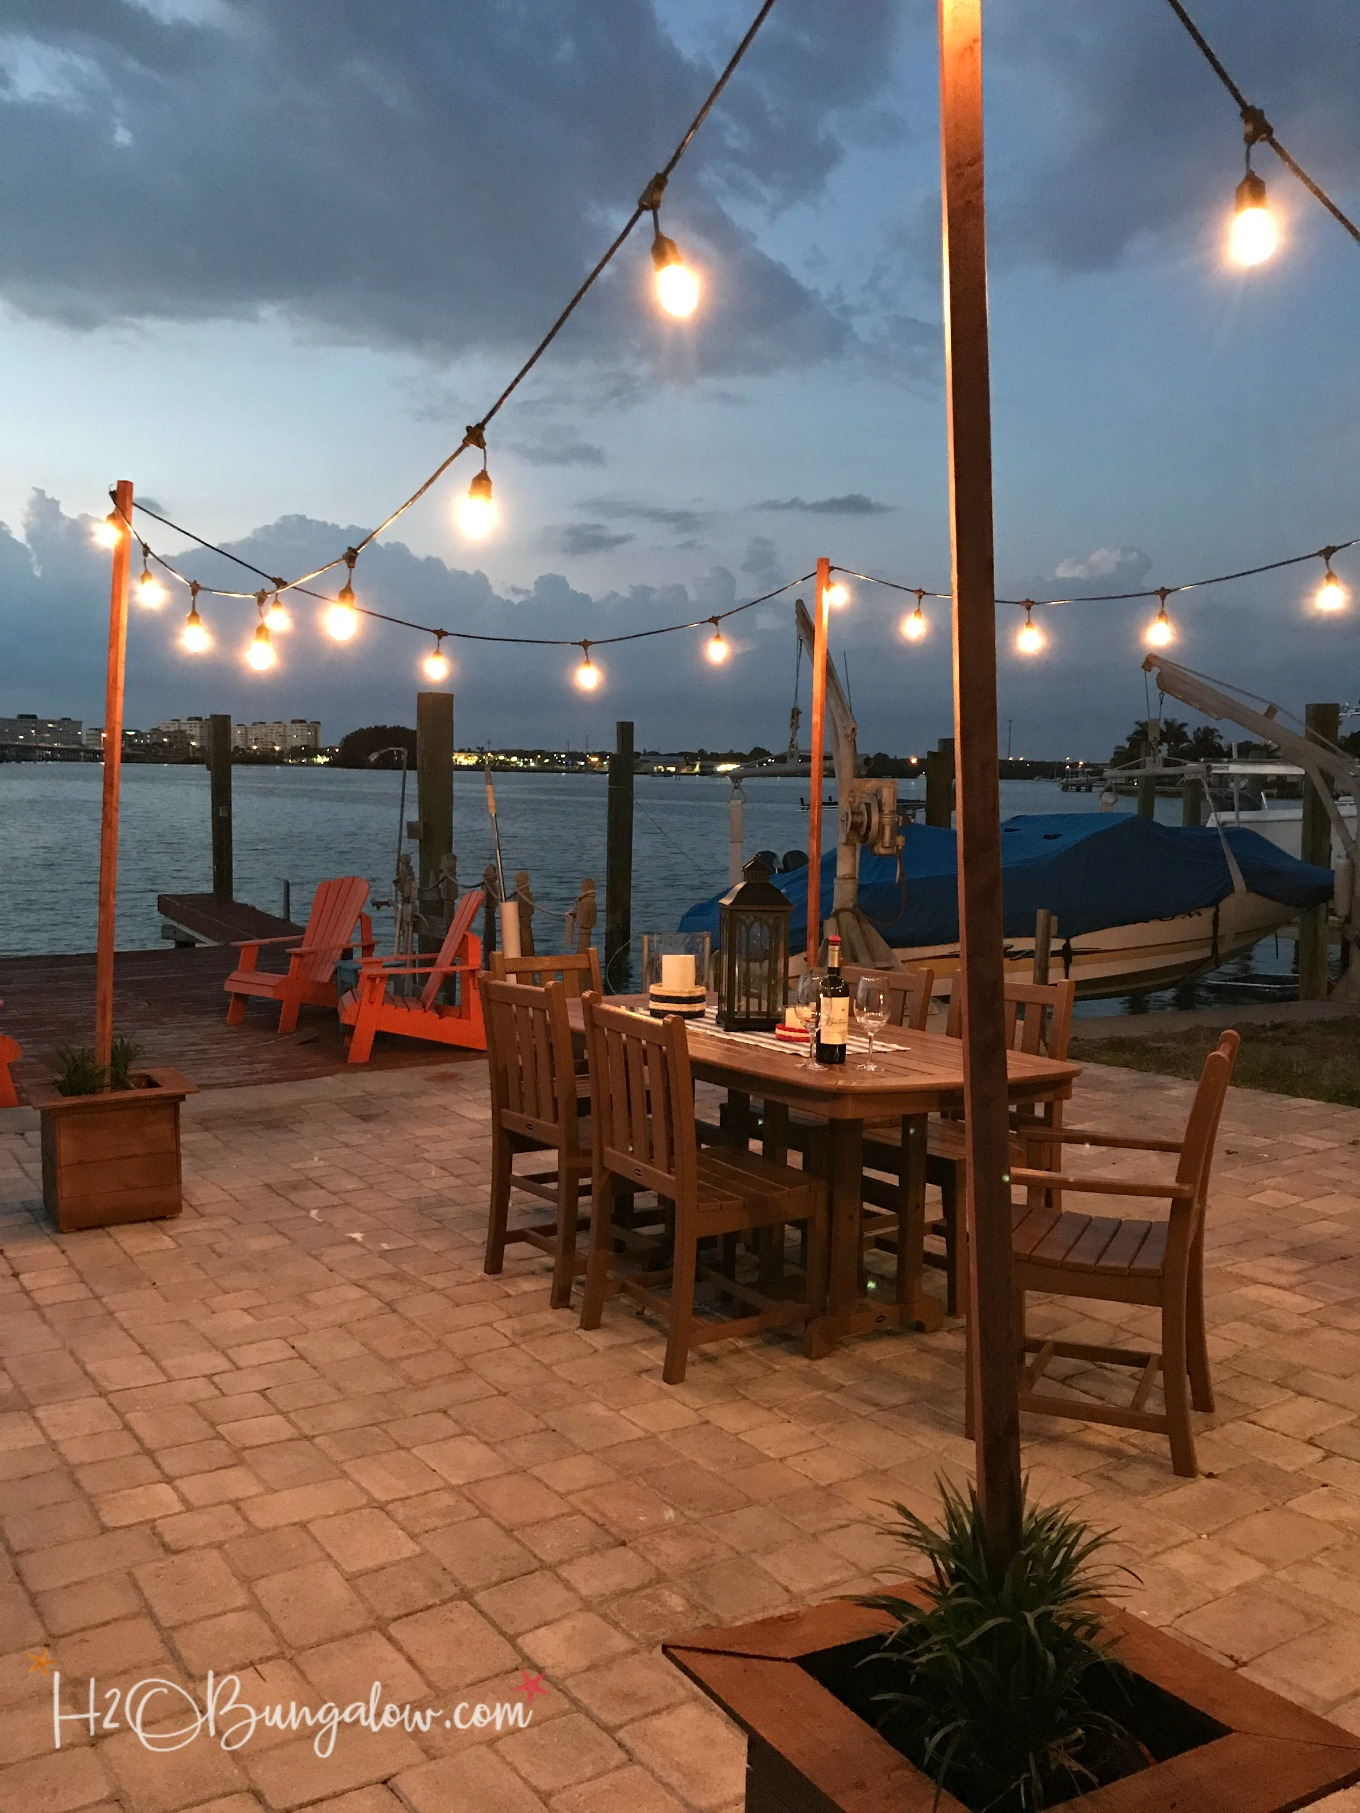 DIY Outdoor String Lights on Poles - H2OBungalow on Backyard String Lights Diy id=44472